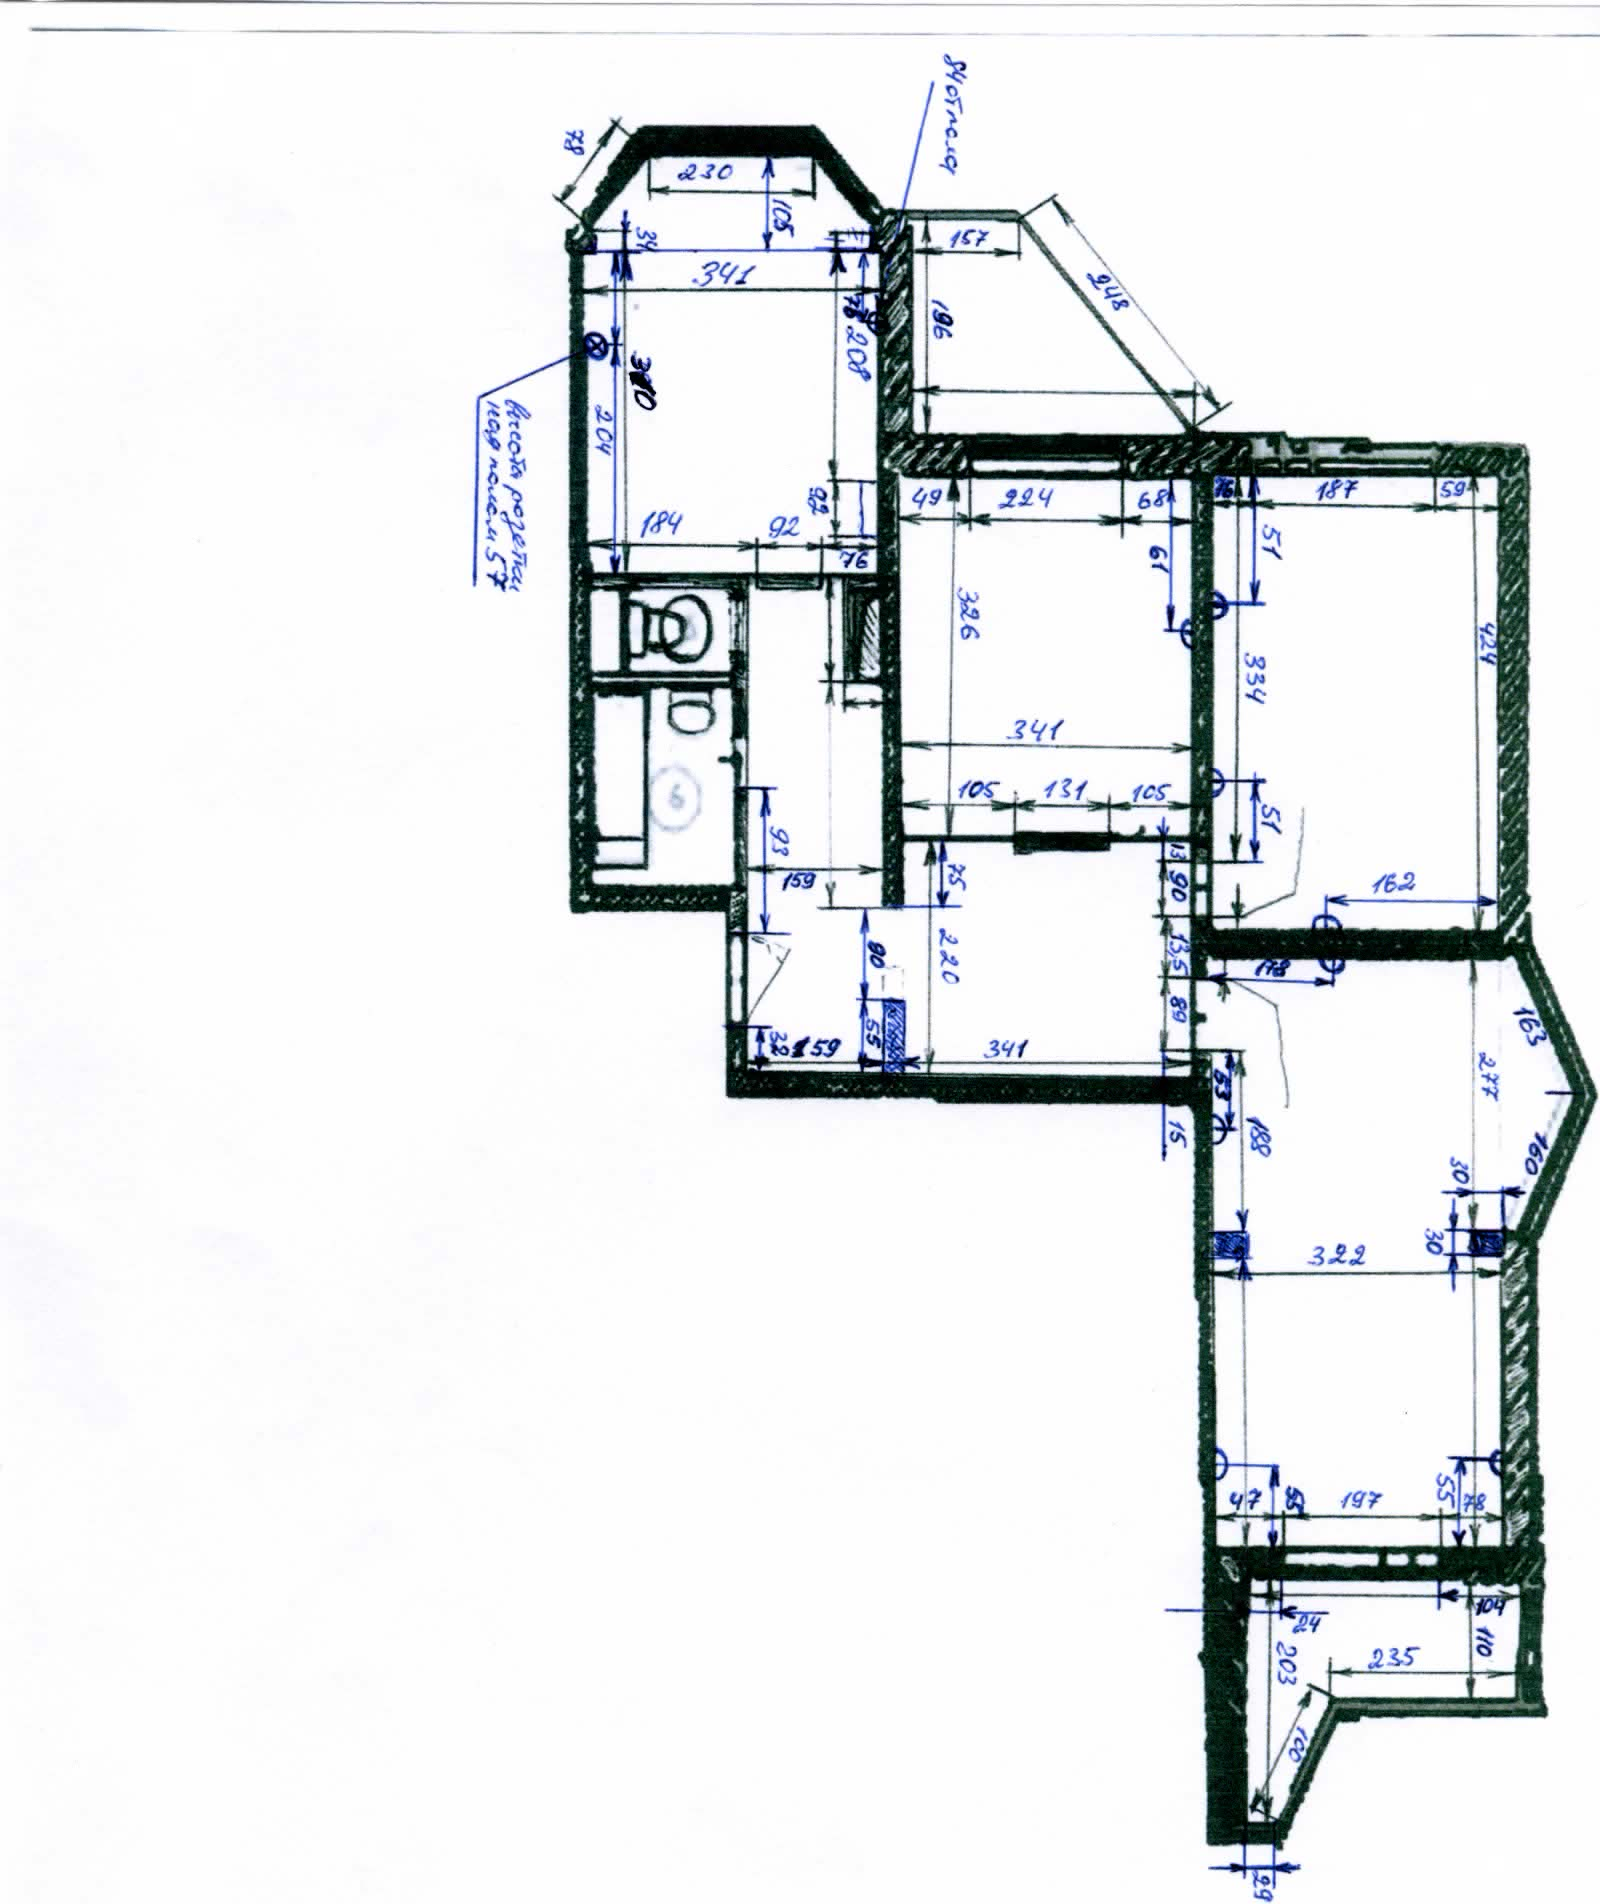 Планировка дома / интересное Чертеж квартиры серии п 44т ins.